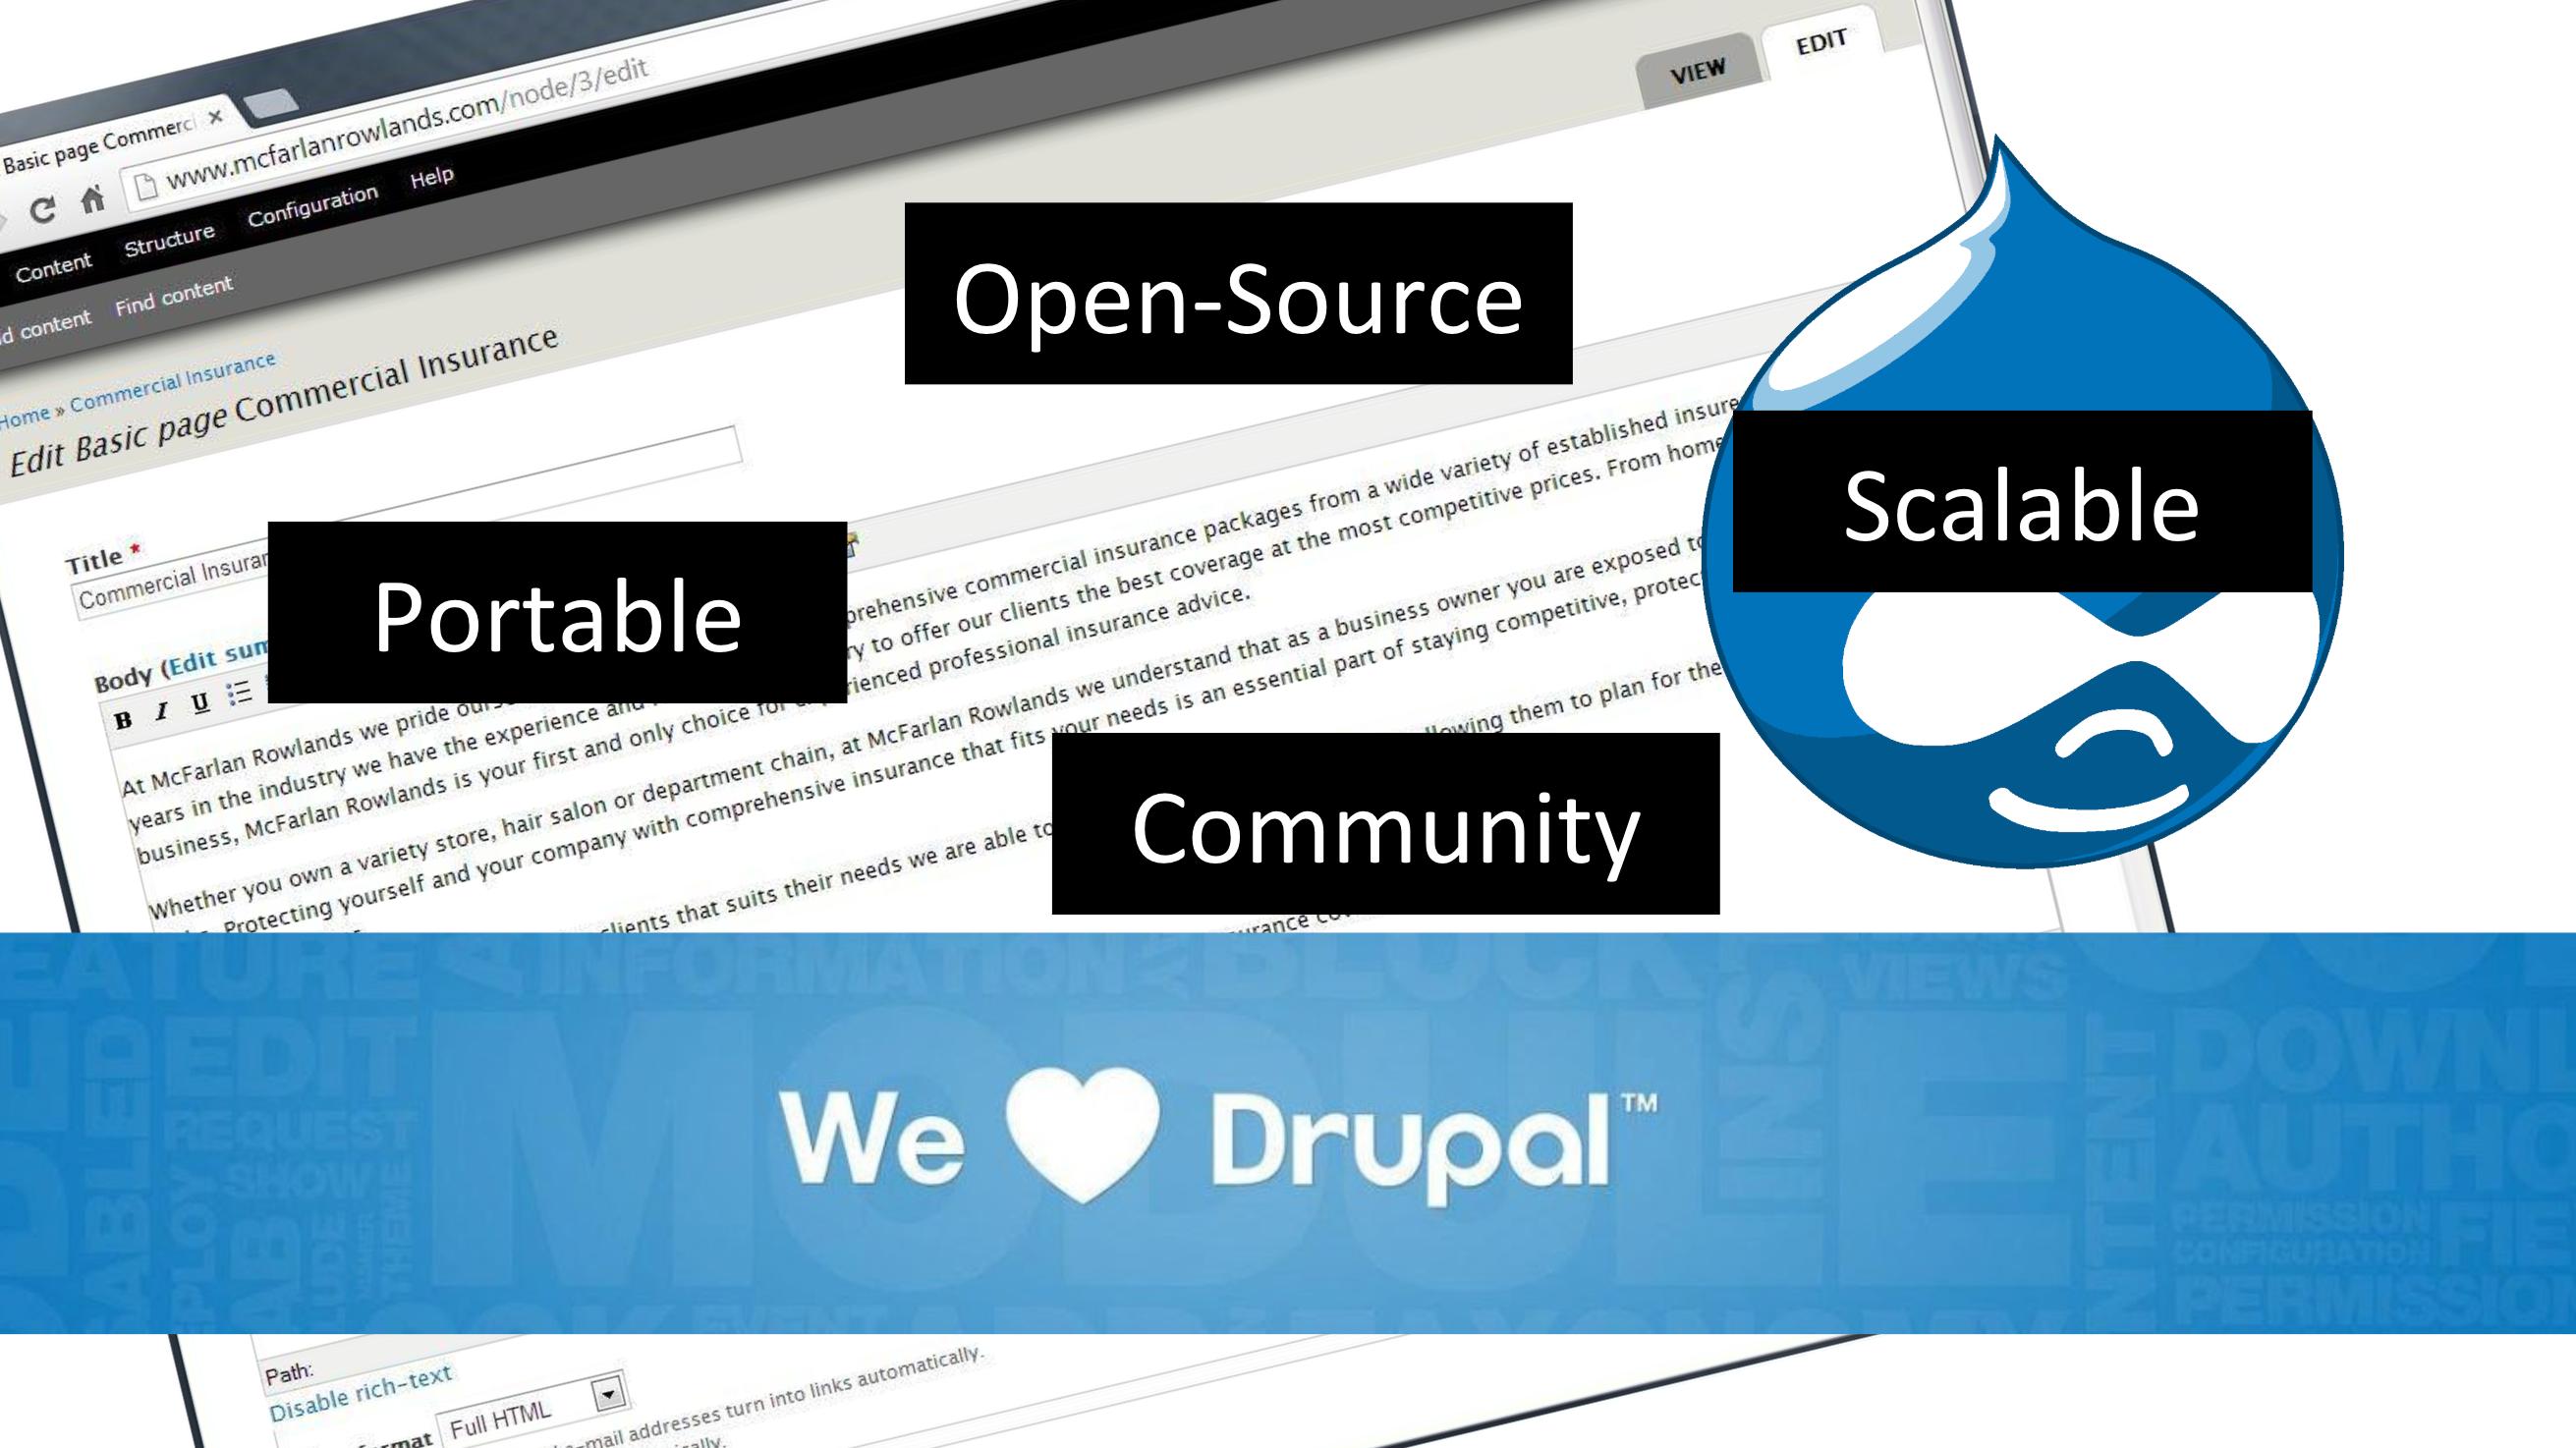 London Ontario Drupal Users Group (LonDUG)